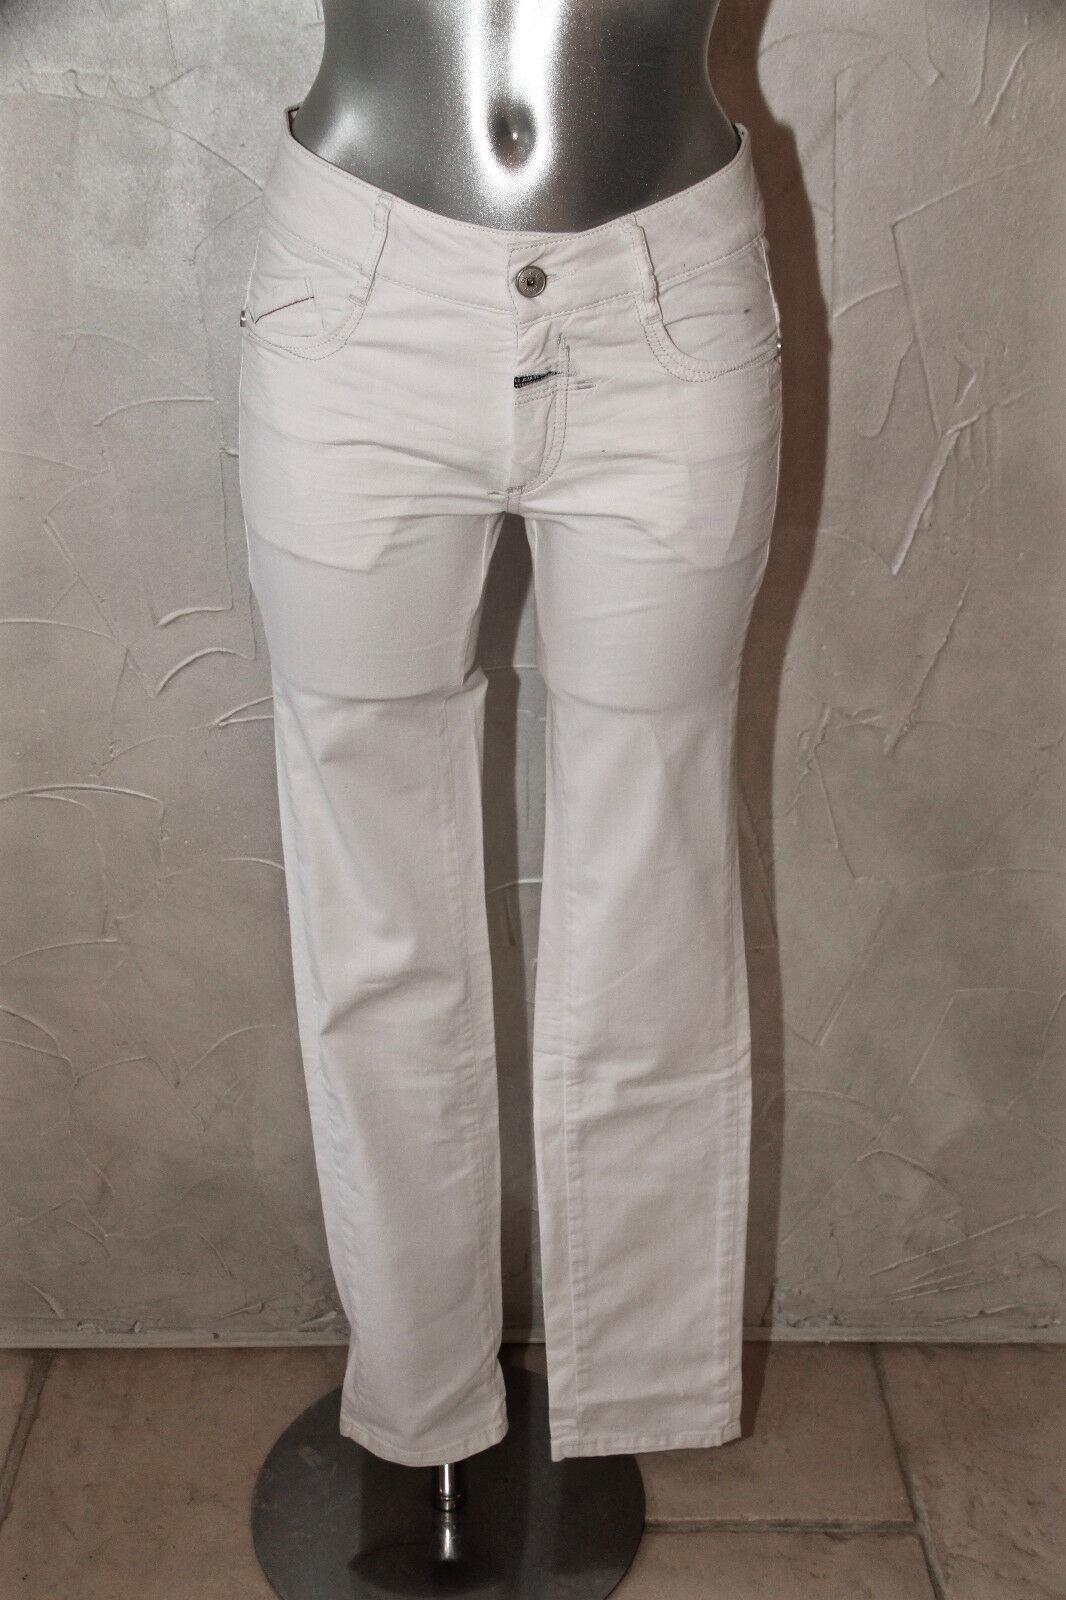 Carino jeans bianco sottile MARITHÉ FRANCOIS GIRBAUD taglia 36 14